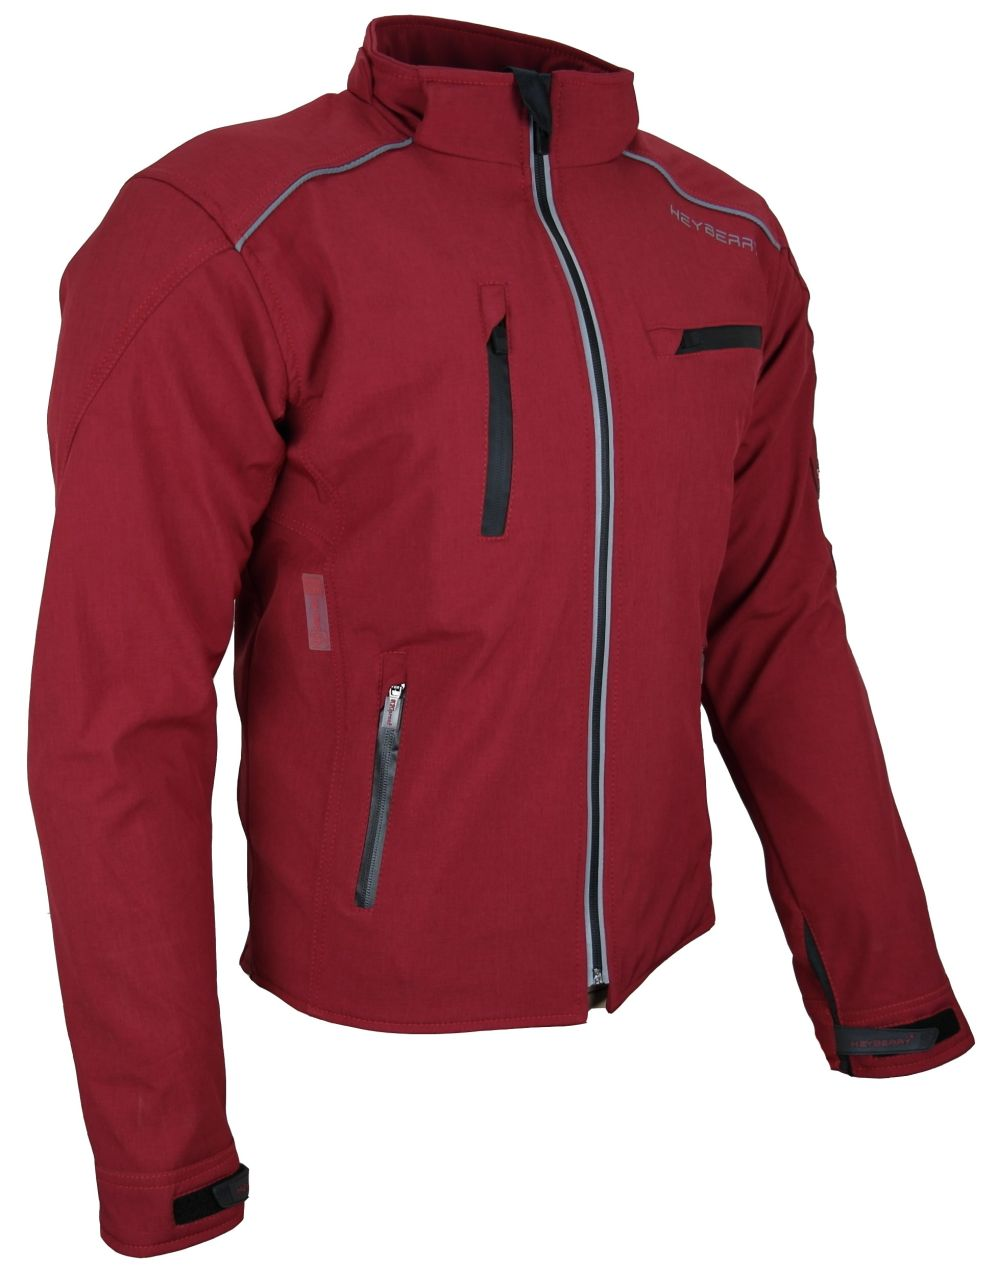 Heyberry Soft Shell Motorradjacke Textil mit Kapuze abnehmbar weinrot Gr. M-3XL